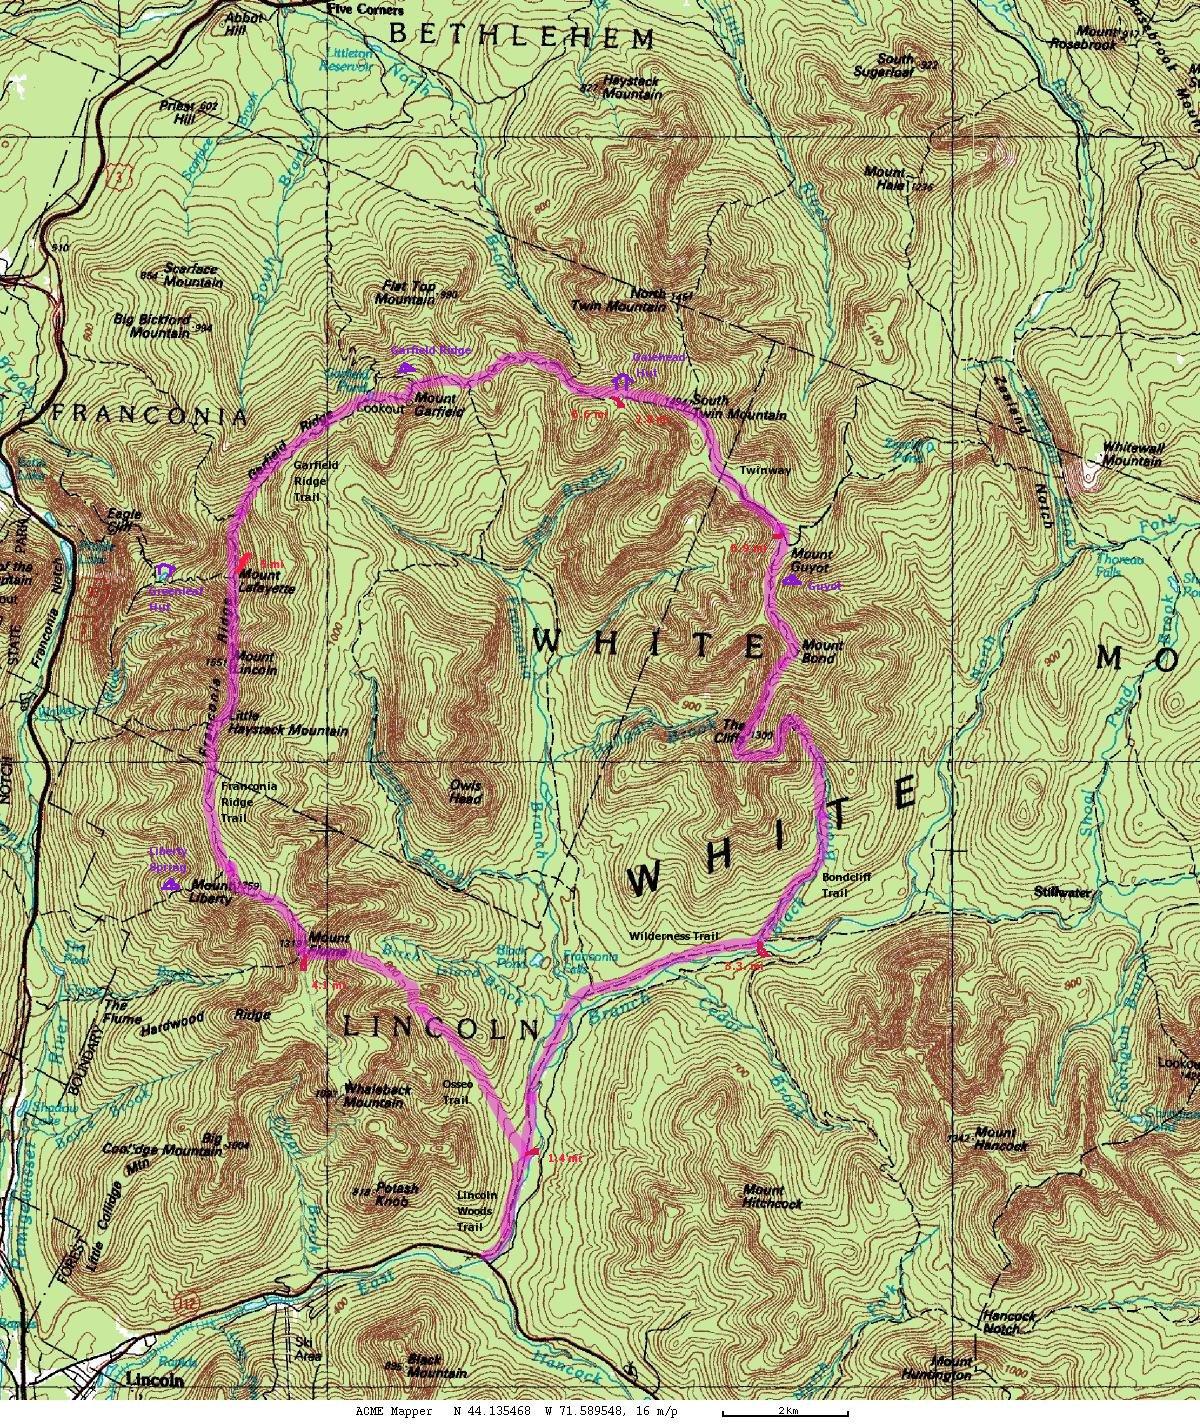 Pemigewasset Loop Map - Appalachian trail topo map